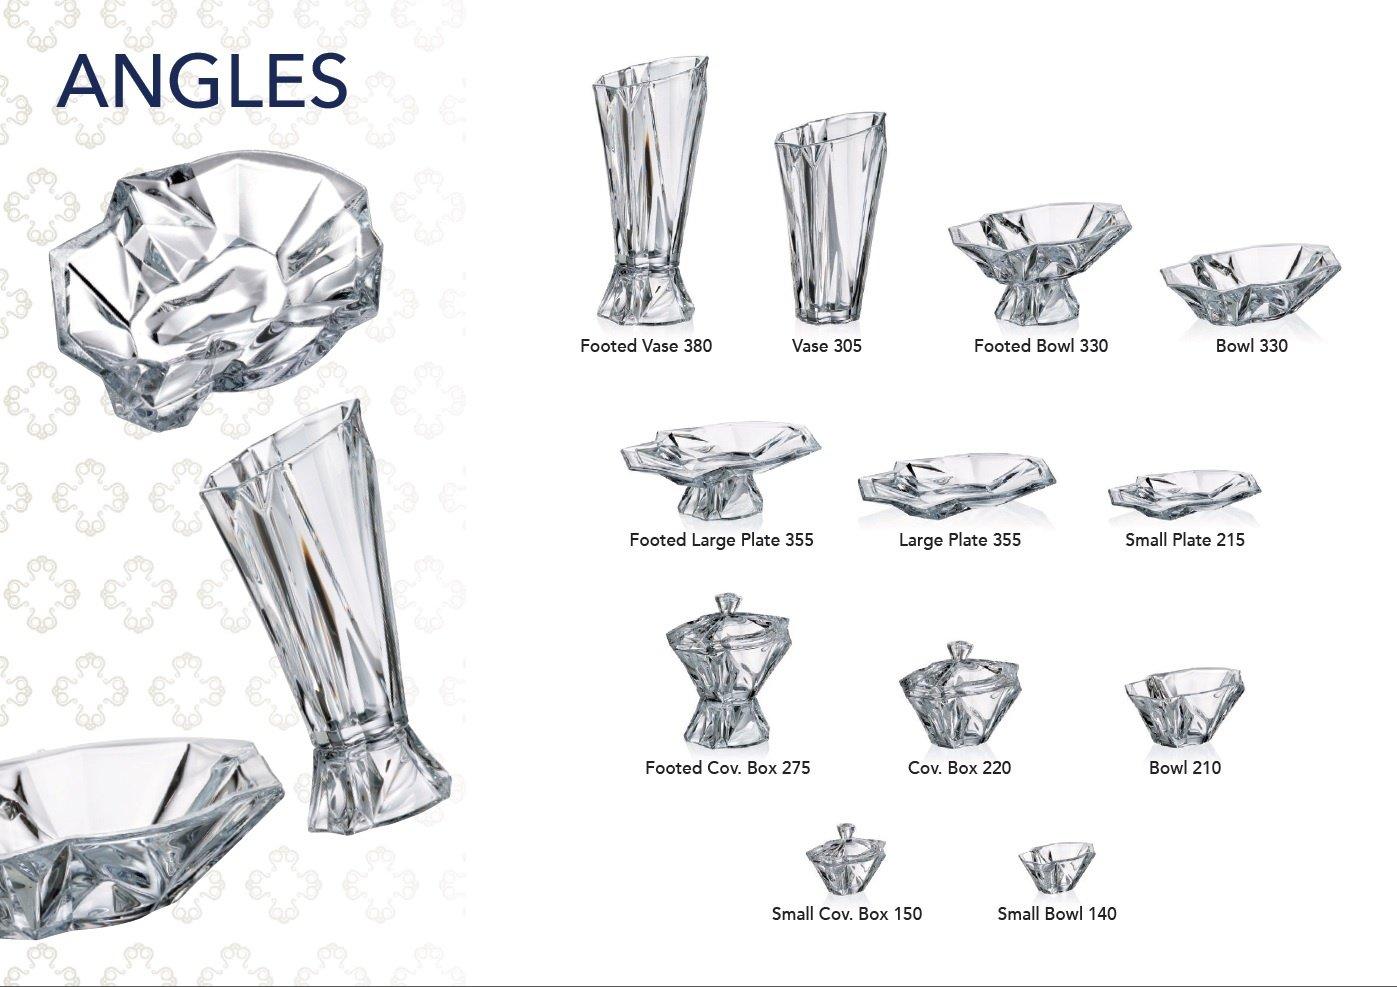 Decorative Vintage Handmade Crystal Candy Bowl ''Angles'' 13-in, Elegant Dish